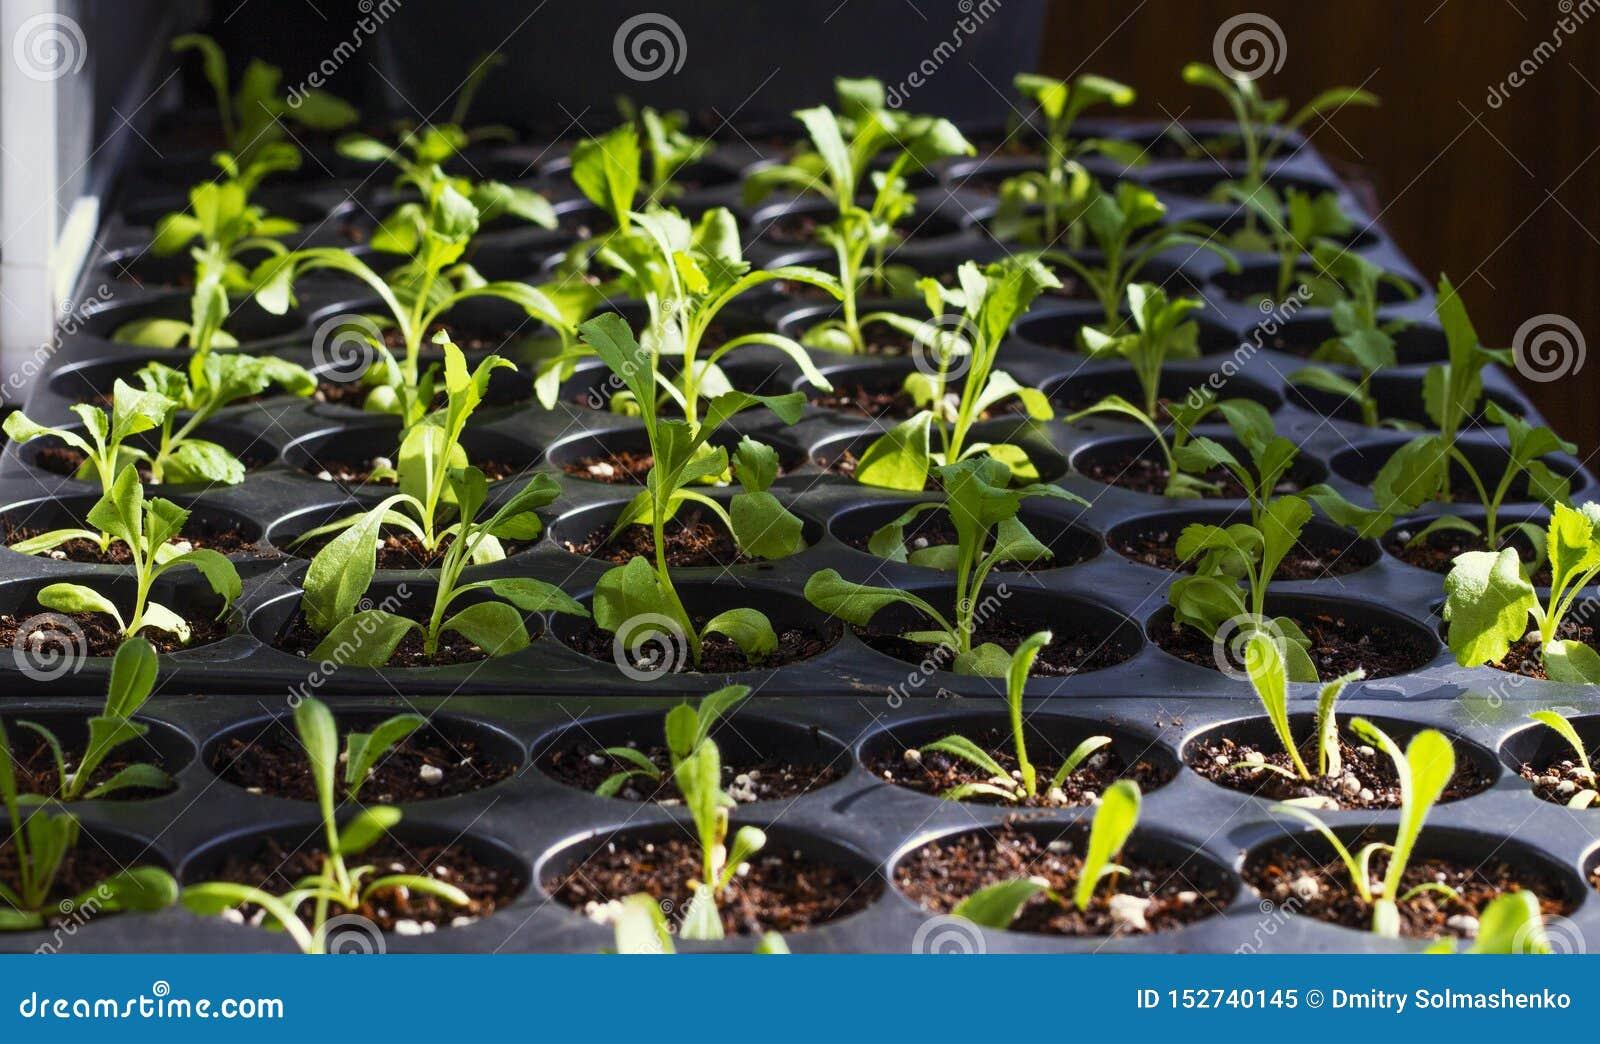 Young fresh seedlings in plastic pots, organic growing vegetables